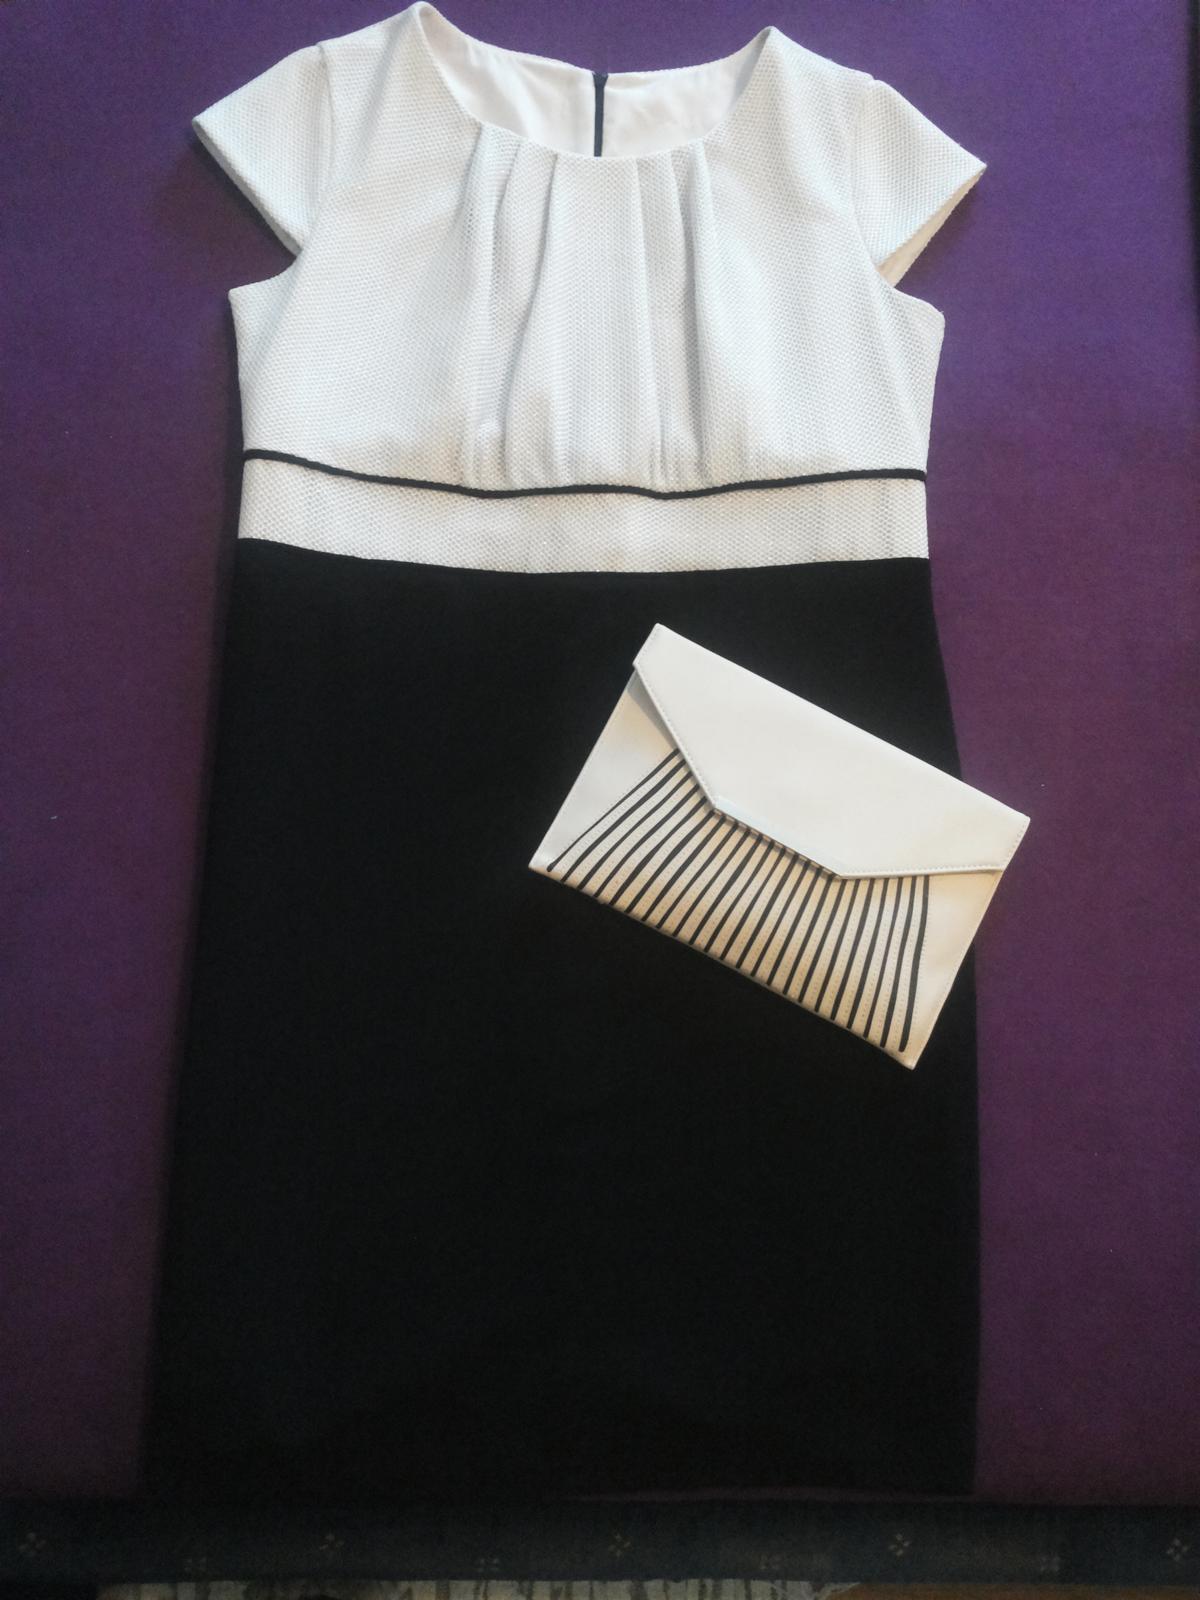 Béžové krátke šaty - Obrázok č. 1